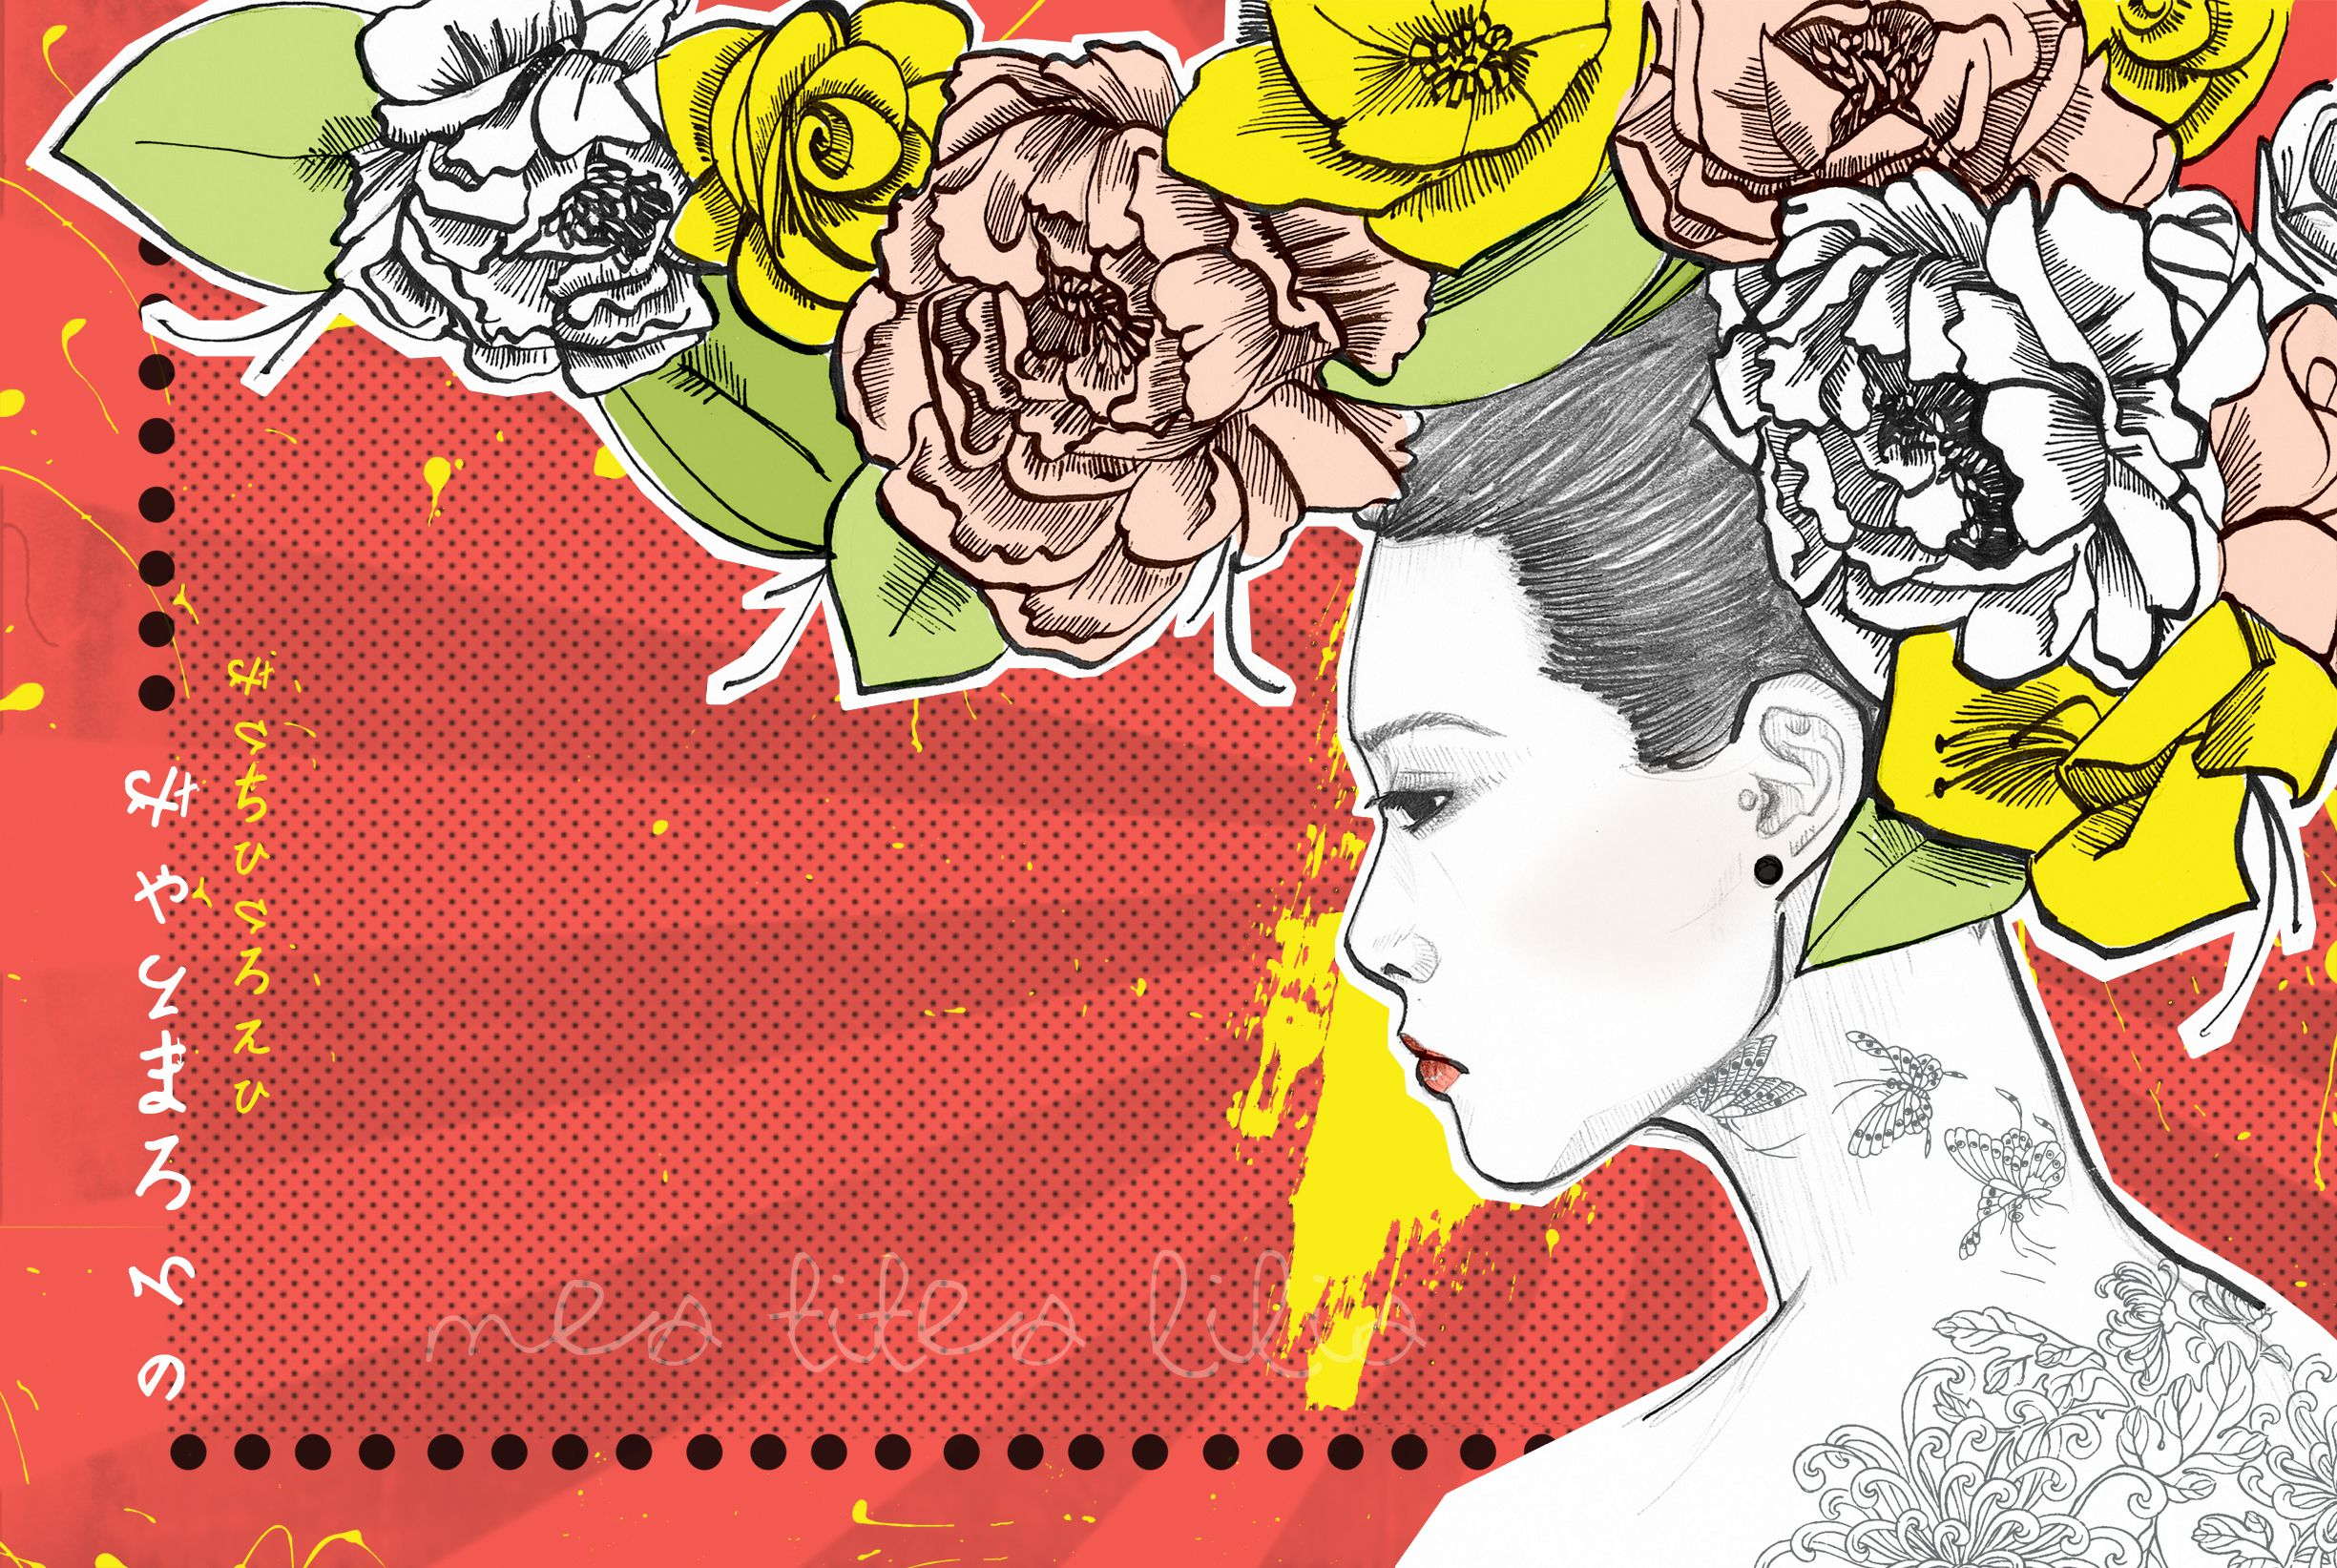 sakura aux pivoines mes tites lilis 2013 illustratrions mes tites lilis pinterest la. Black Bedroom Furniture Sets. Home Design Ideas